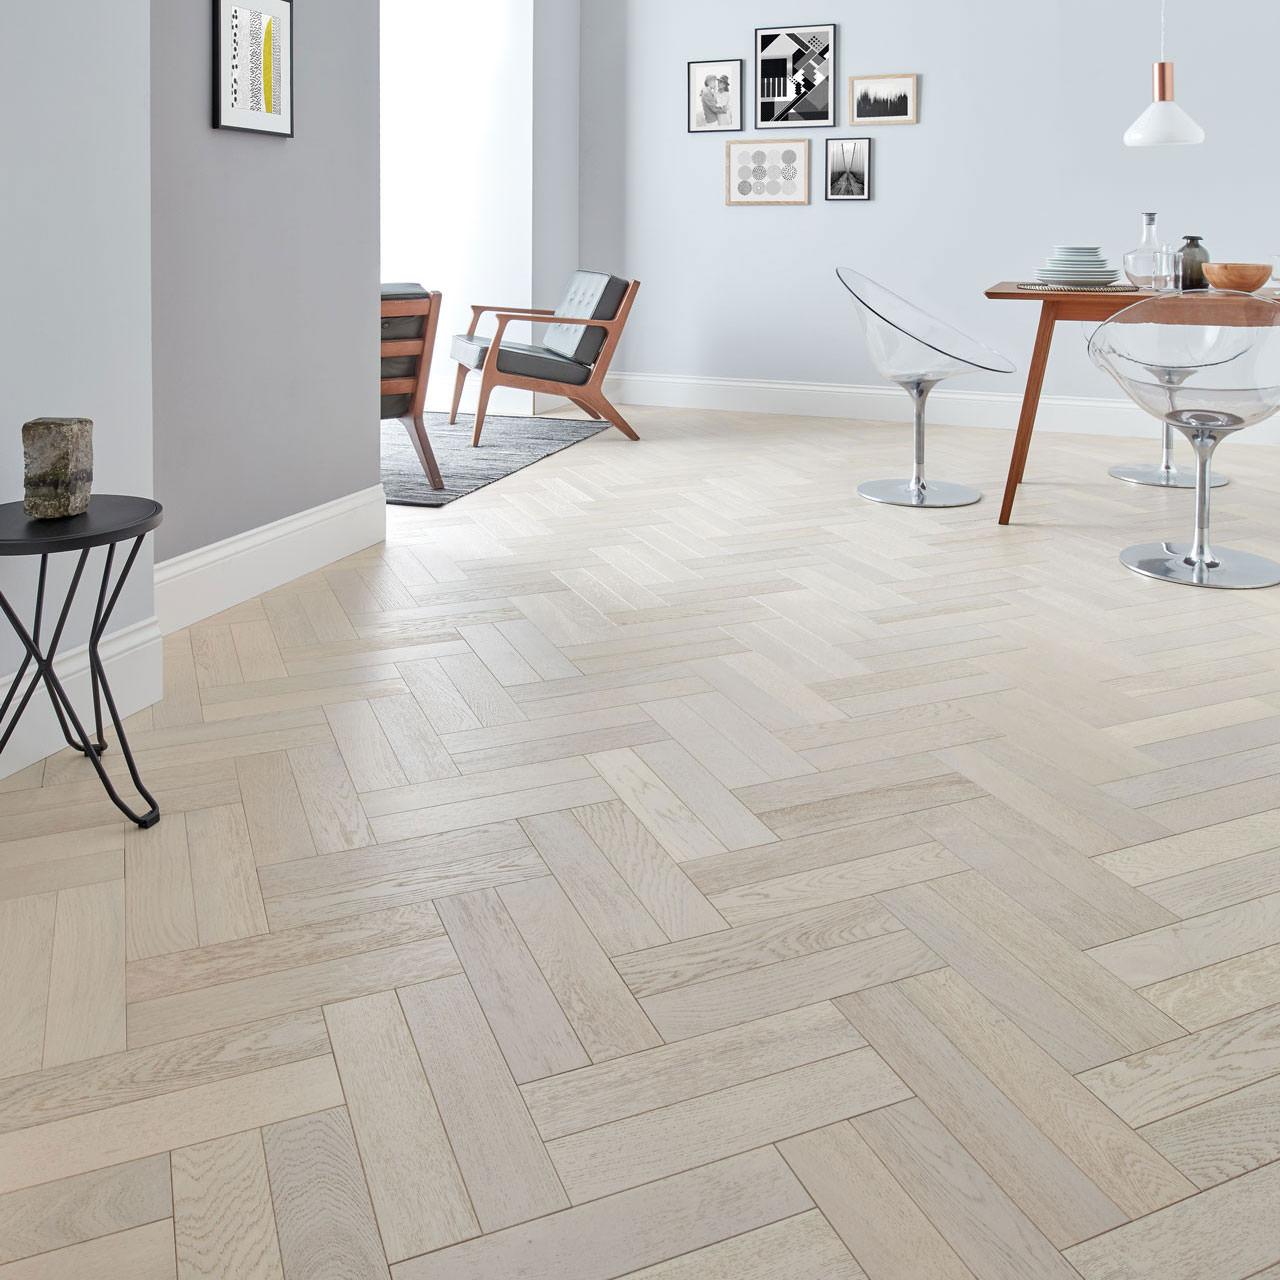 70mm x 500mm Natural Unfinished Solid Oak Herringbone Wood Flooring, 20mm Thick